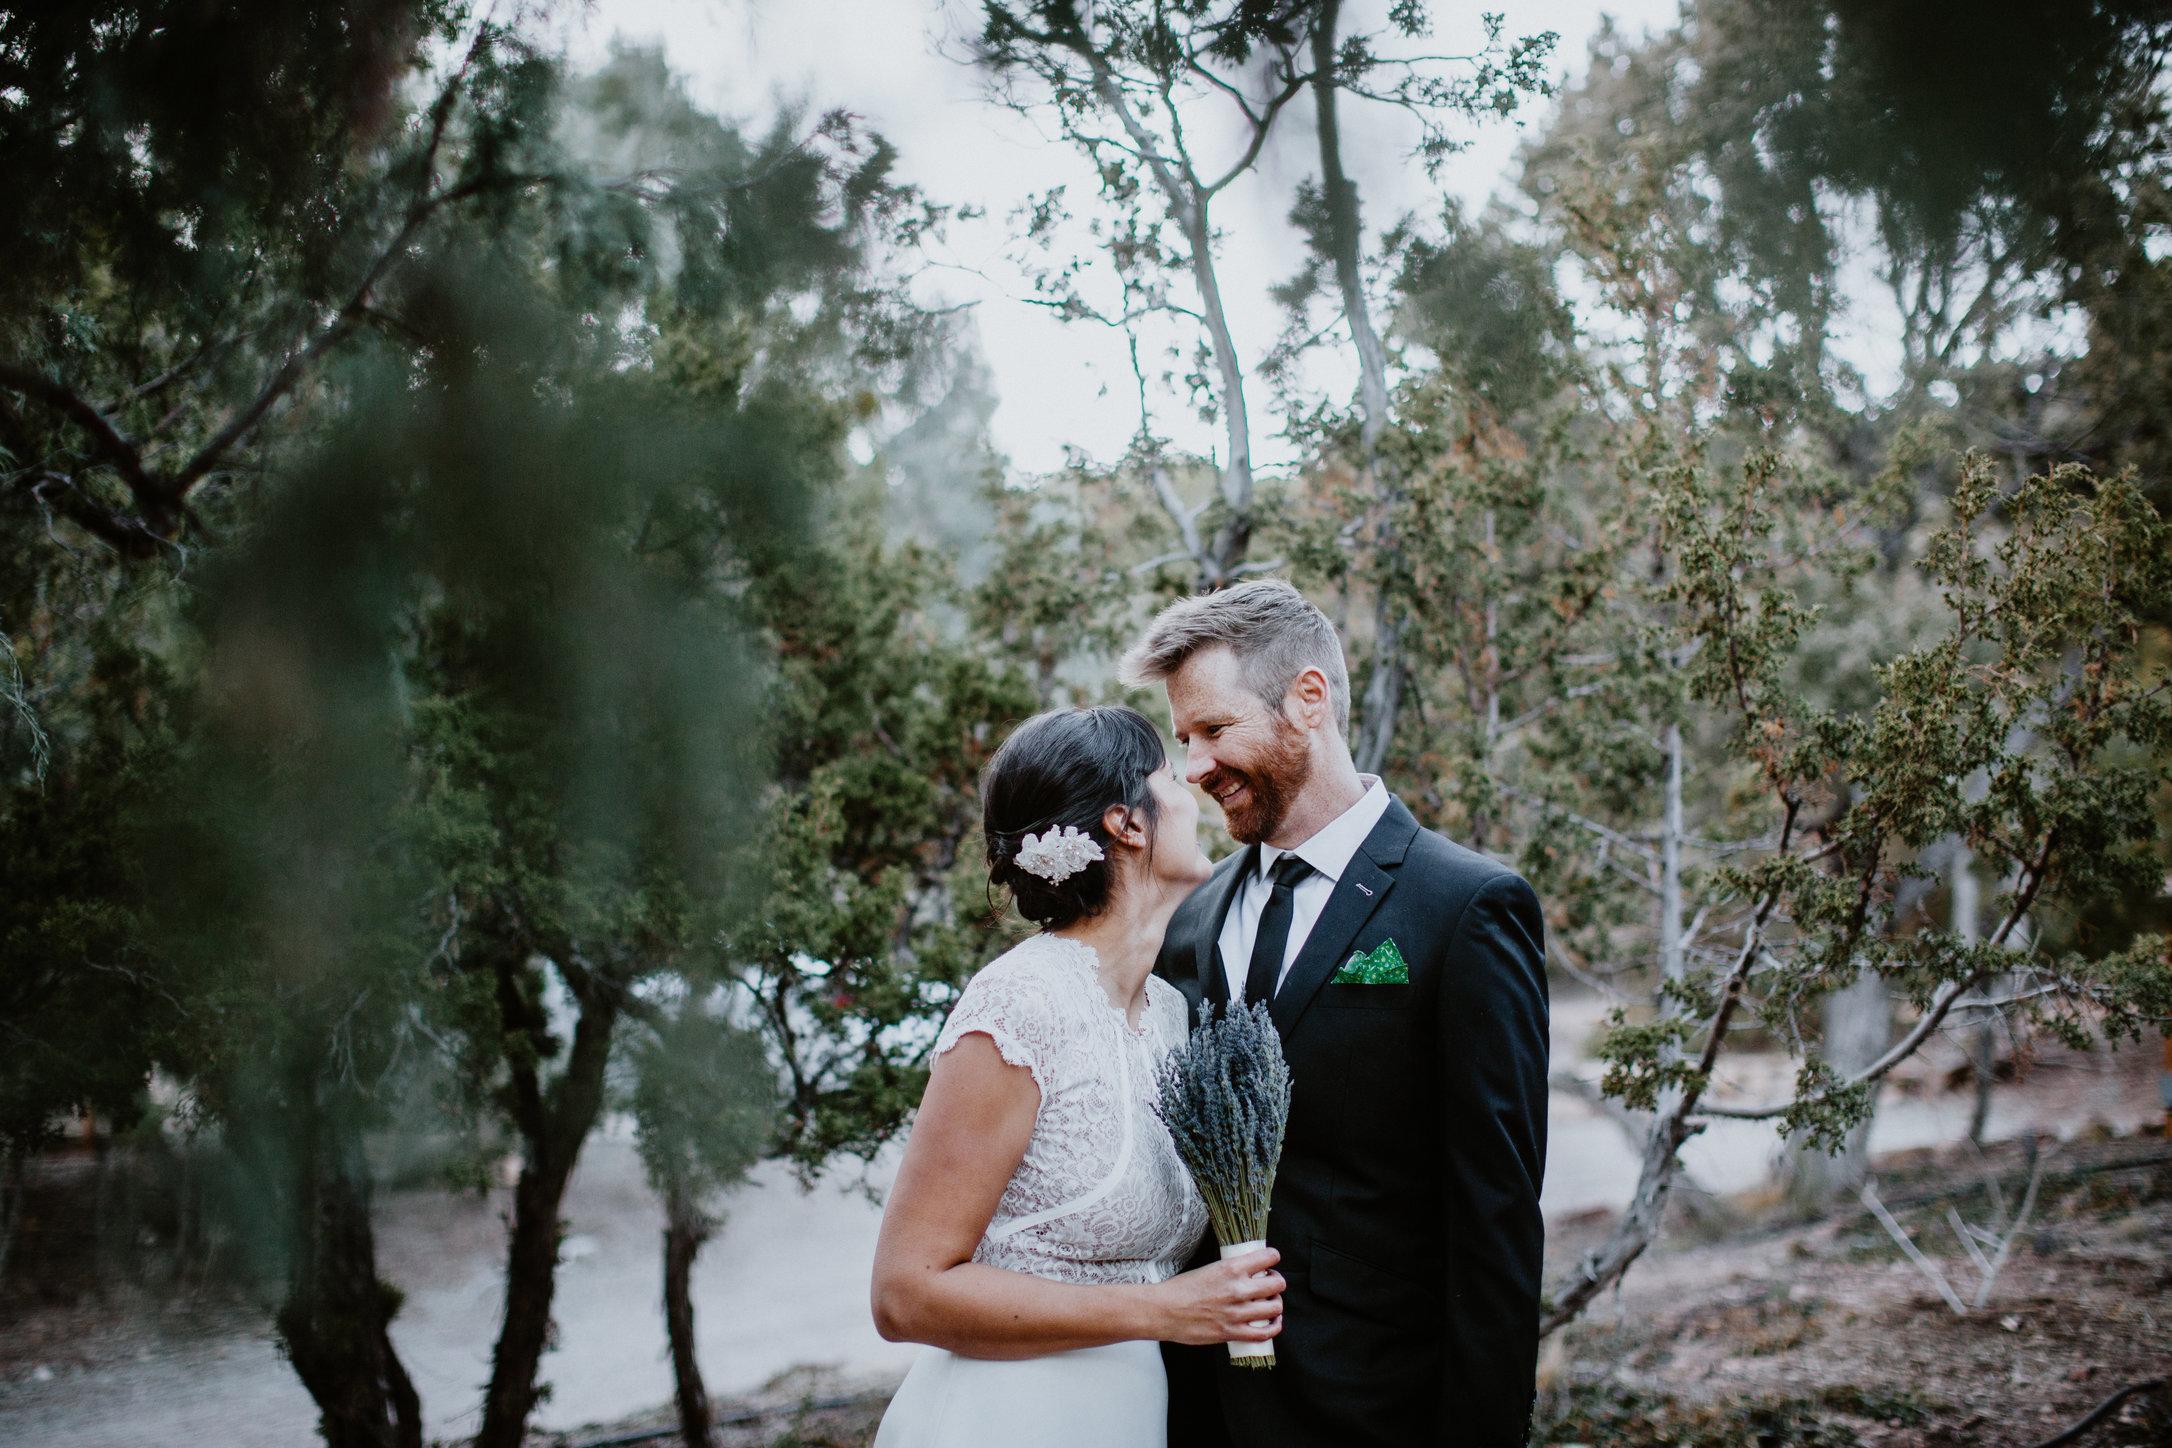 HandM-wedding-154.jpg